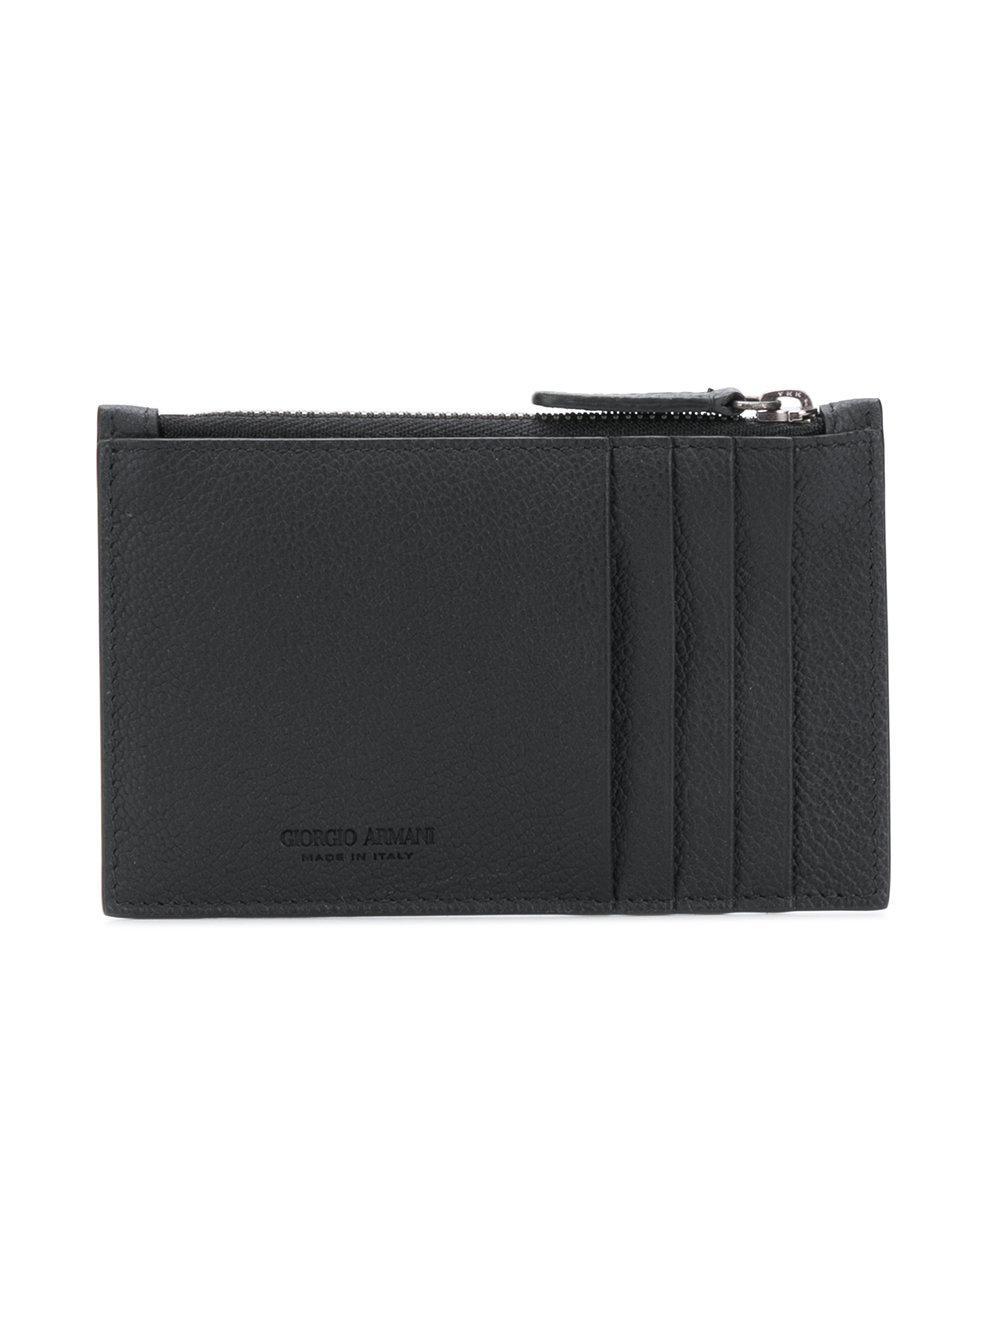 4fdb851fe9 Lyst - Giorgio Armani Slimline Card Holder in Black for Men